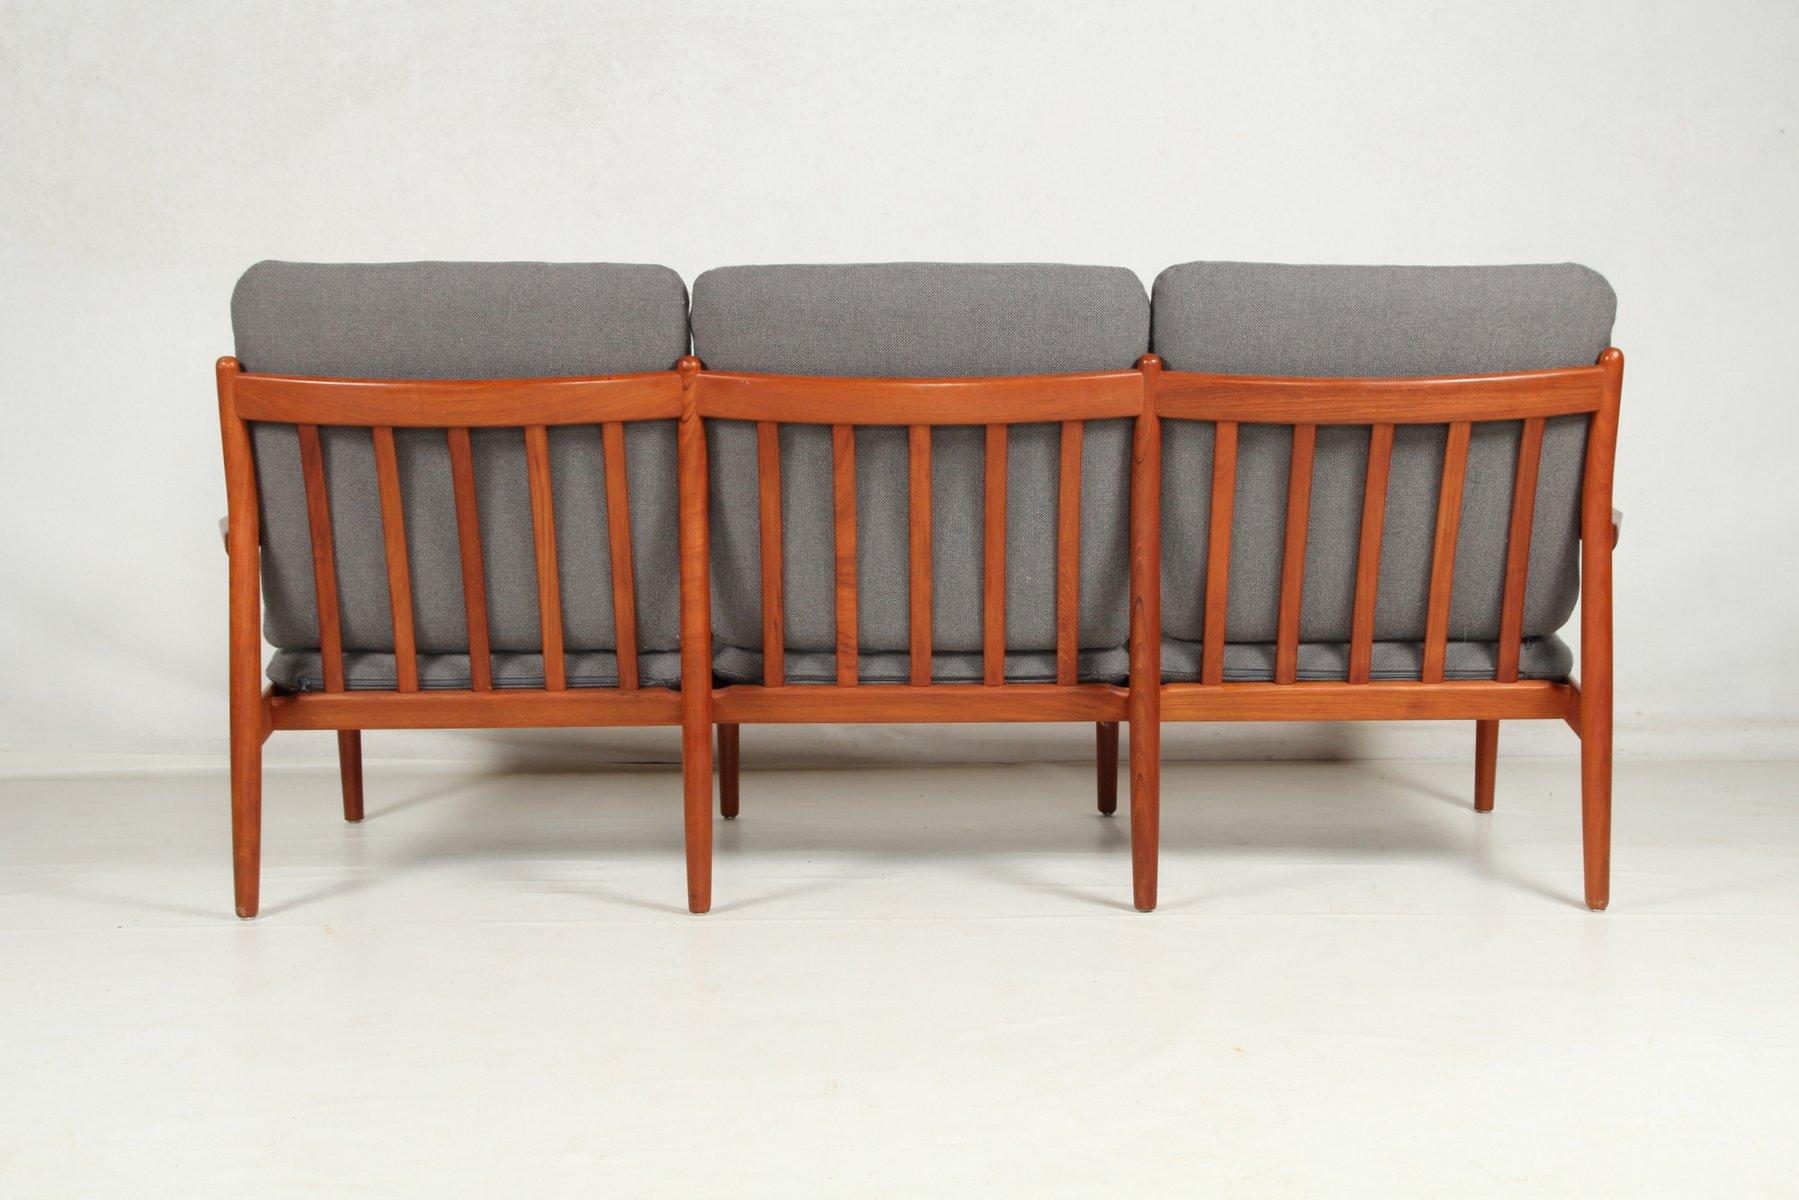 Vintage Teak Sofa by Grete Jalk for Glostrup for sale at Pamono